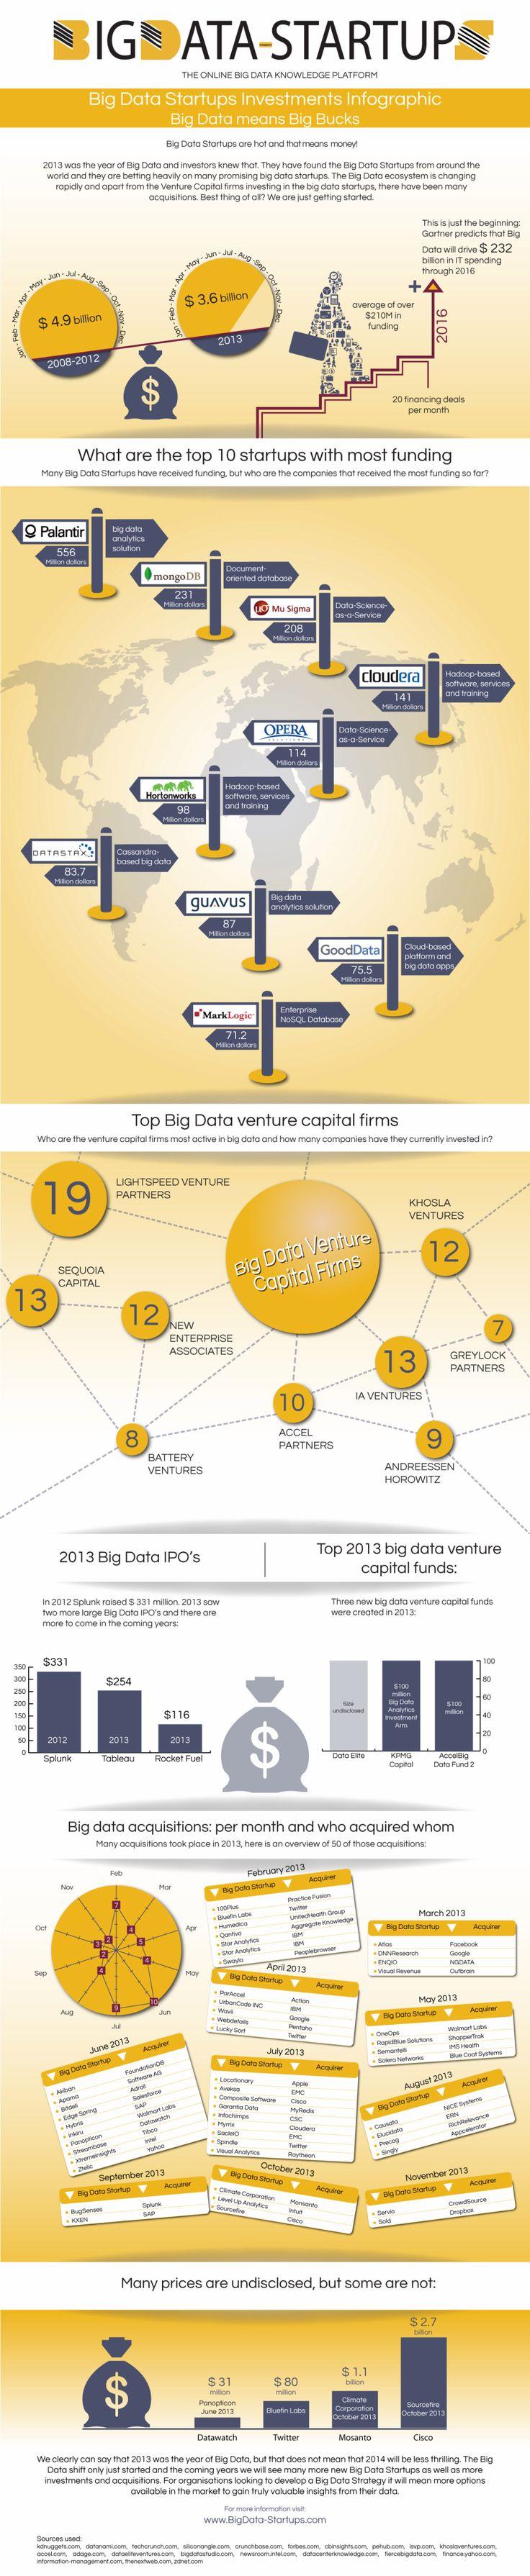 Big Data Startups Investment Infographic - Big Data means Big dollars